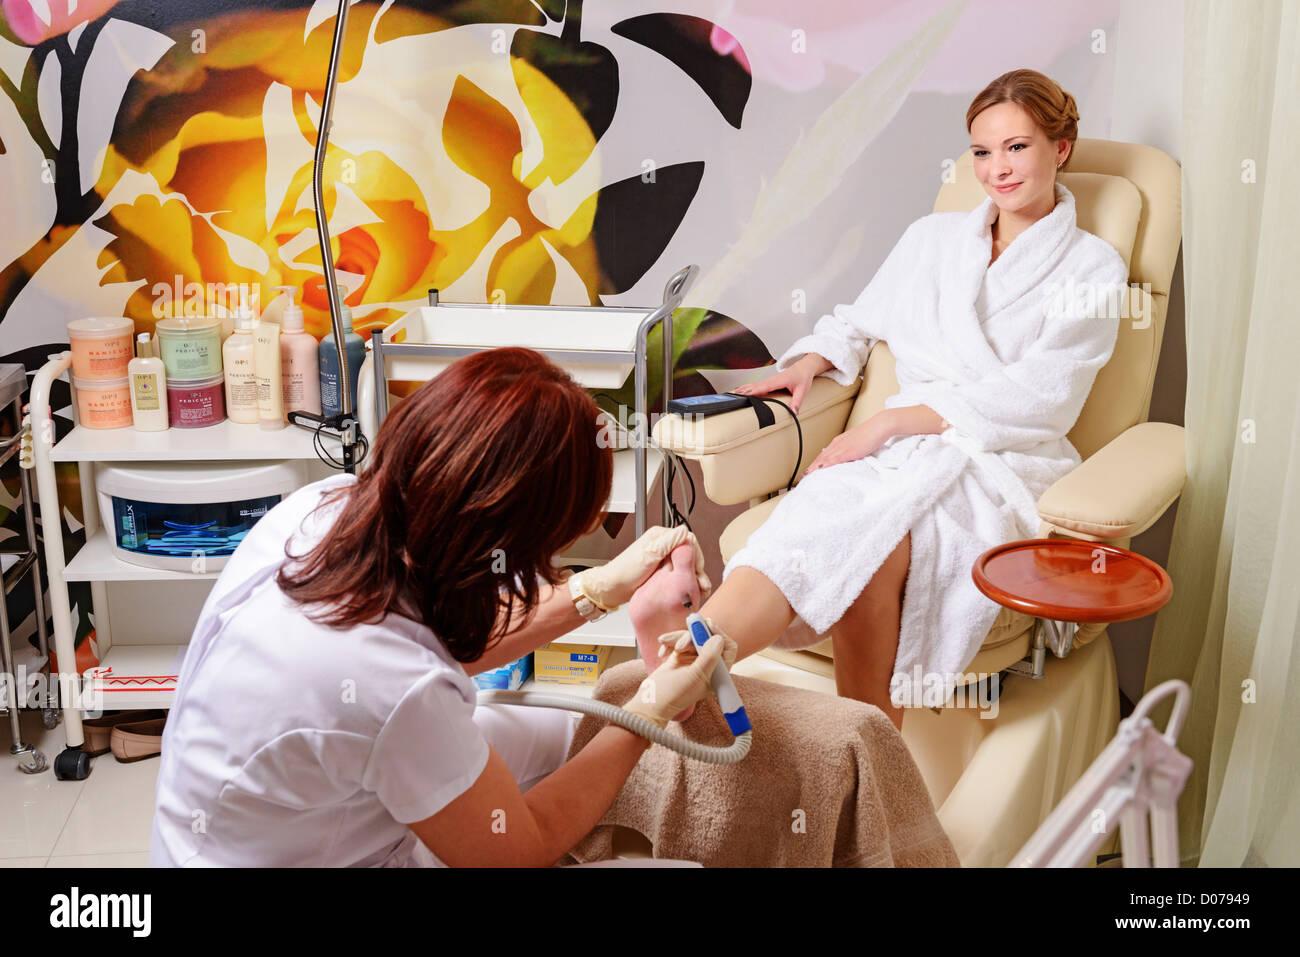 woman spa salon treatment procedure health beauty body wellness - Stock Image